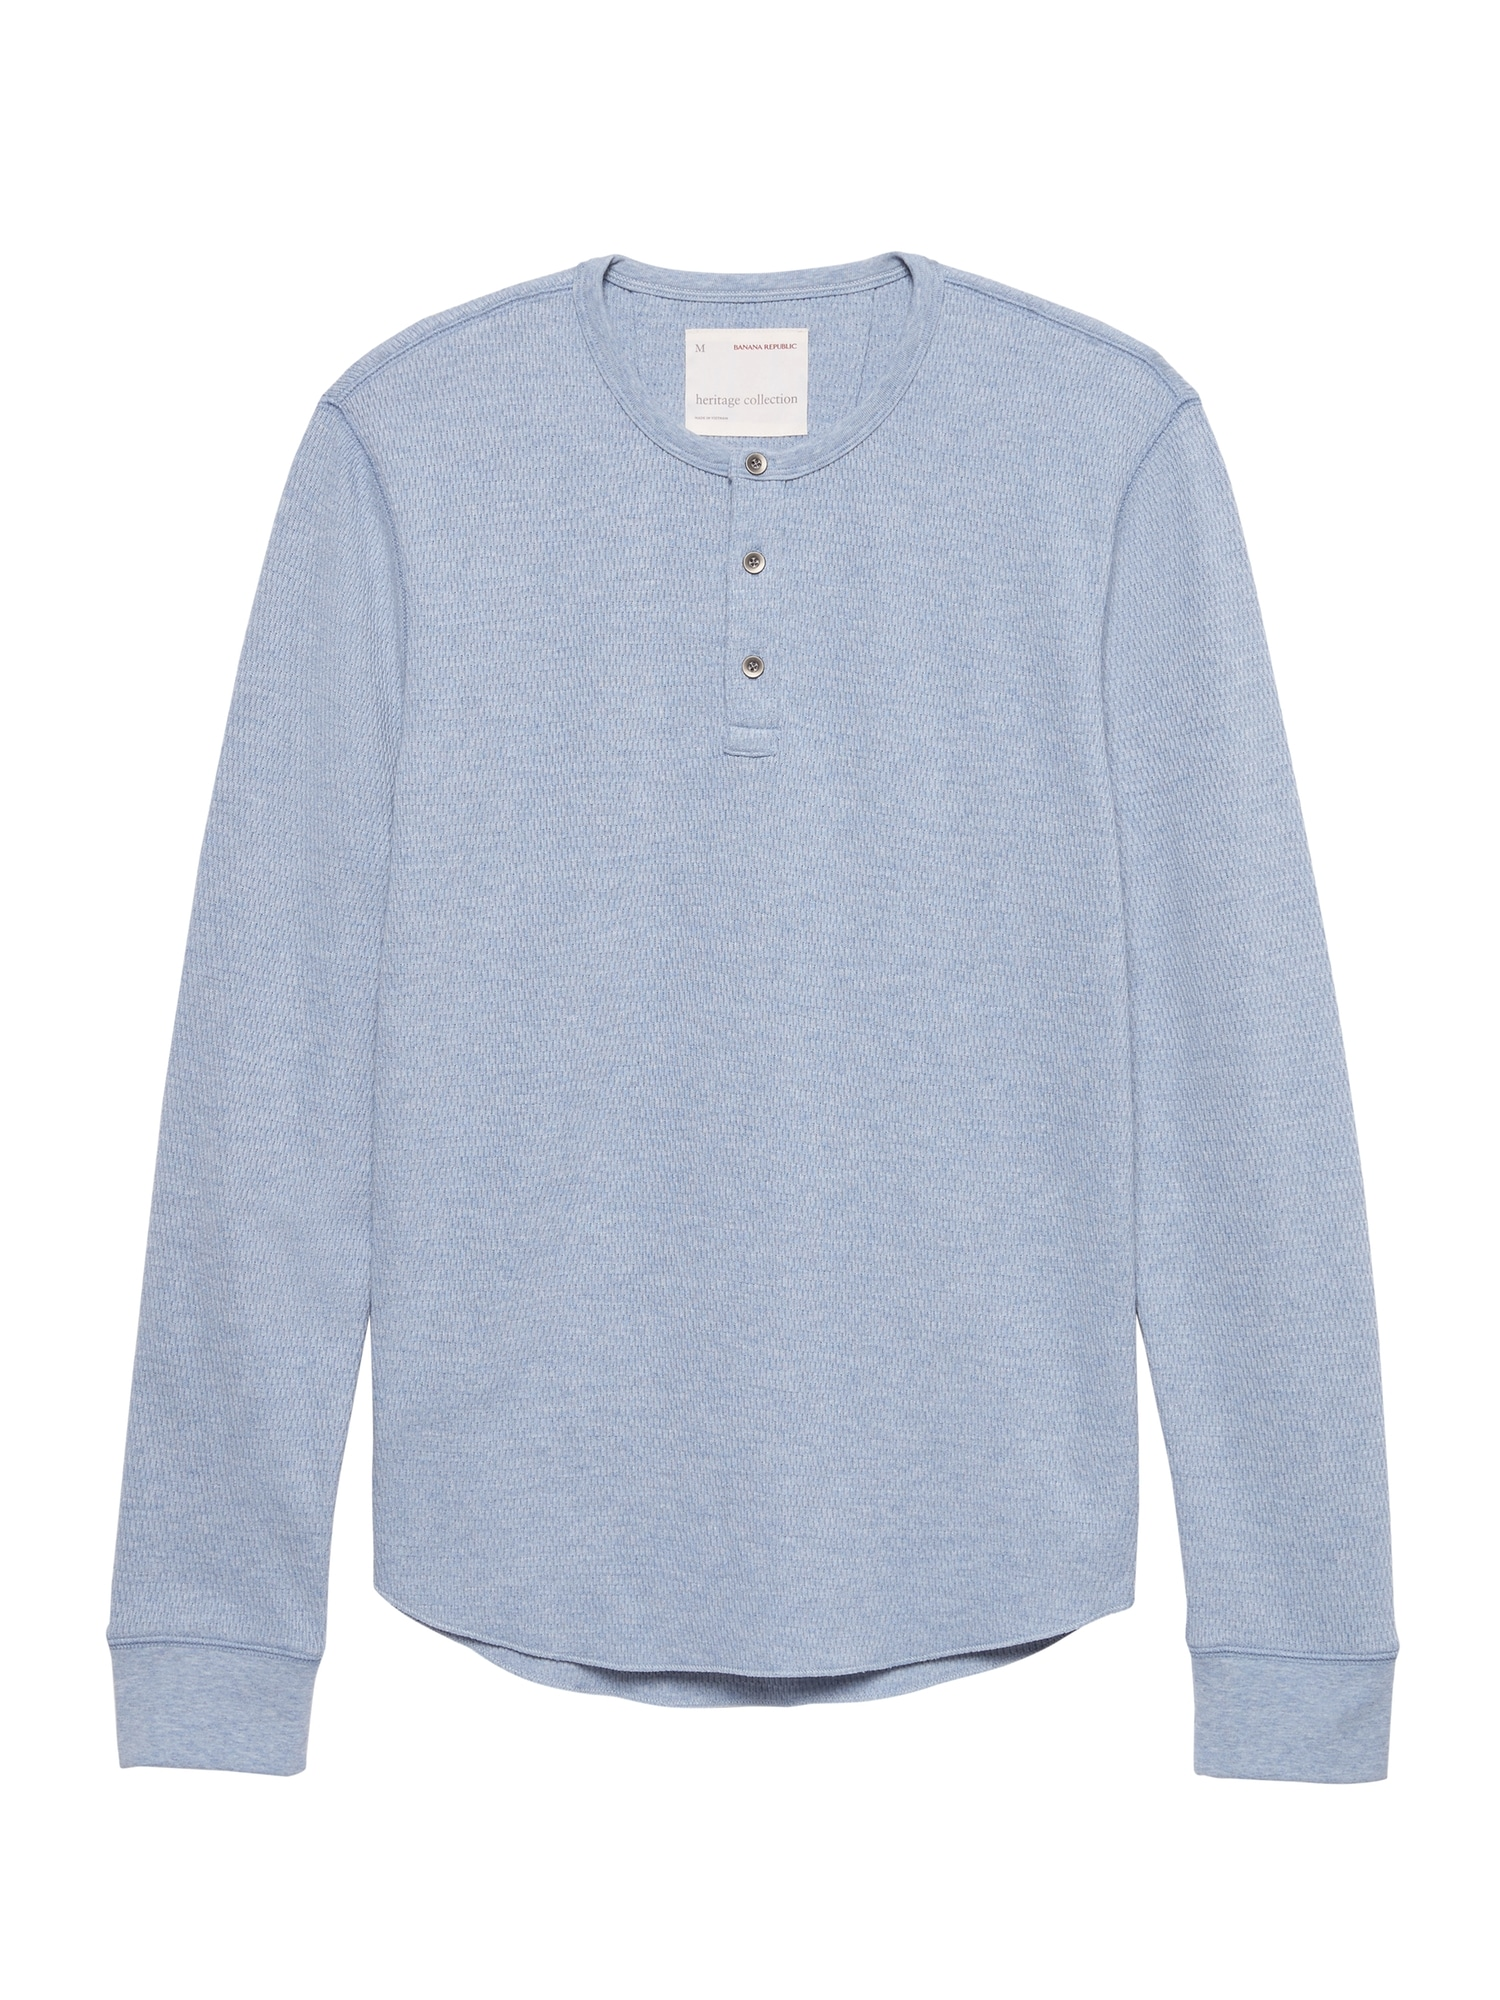 8530c555 Heritage Waffle-Knit Henley Thermal T-Shirt | Banana Republic